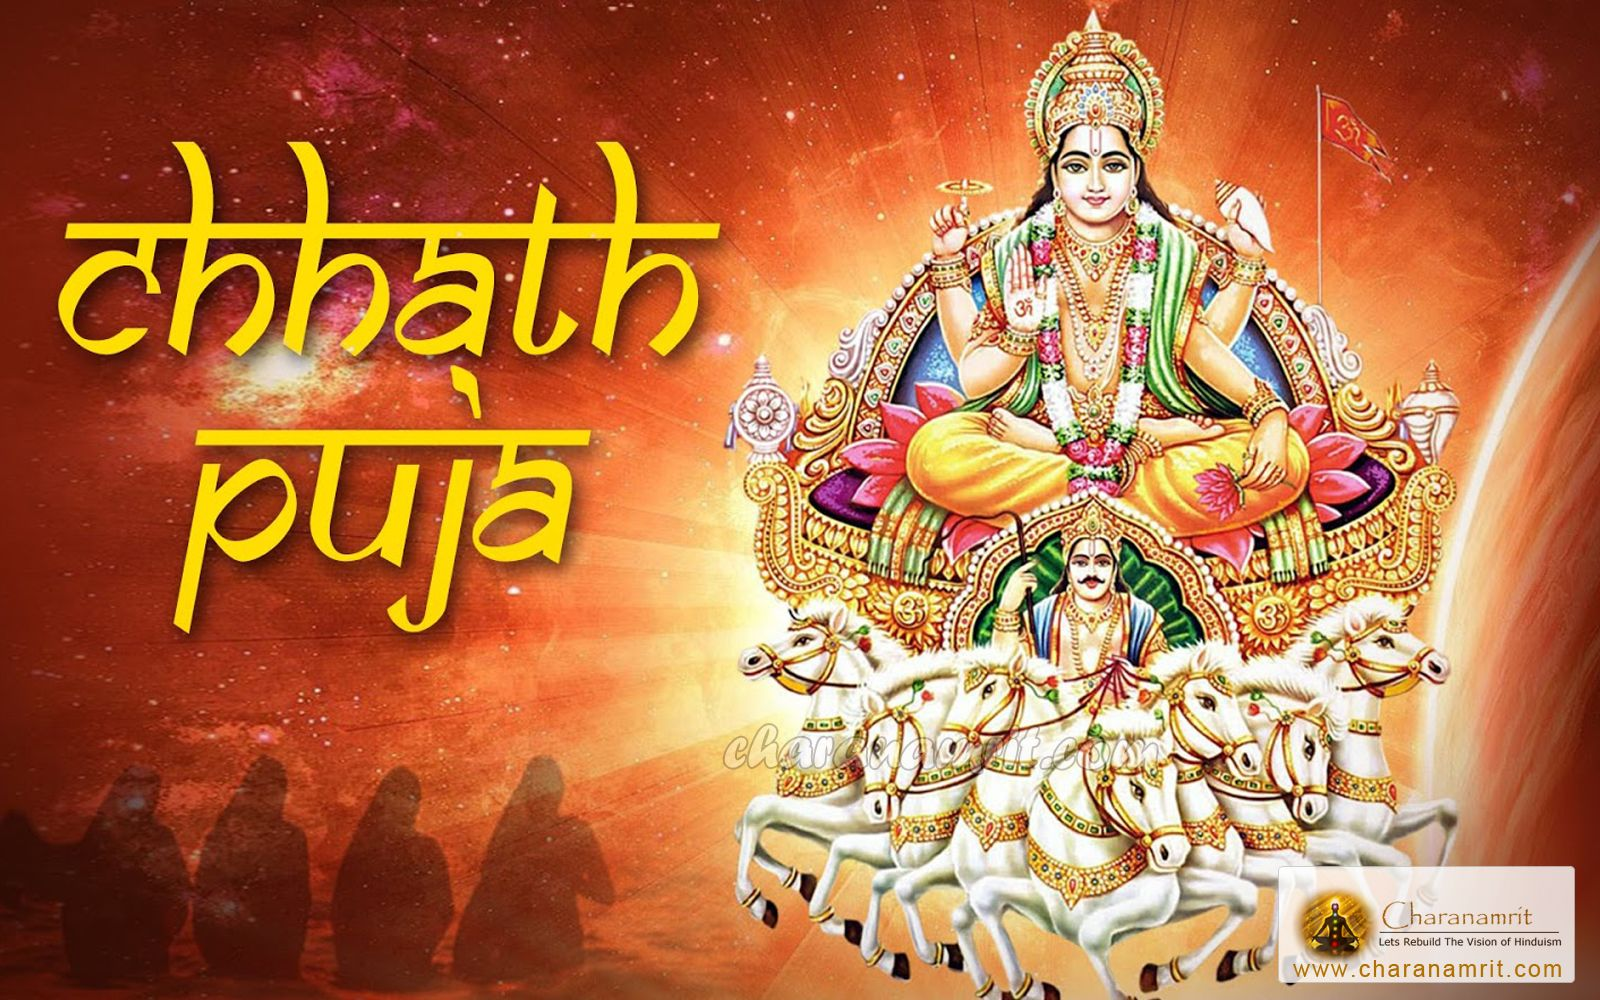 Bihar Chhath Mata Beautiful Wallpapers #Charanamrit # ...